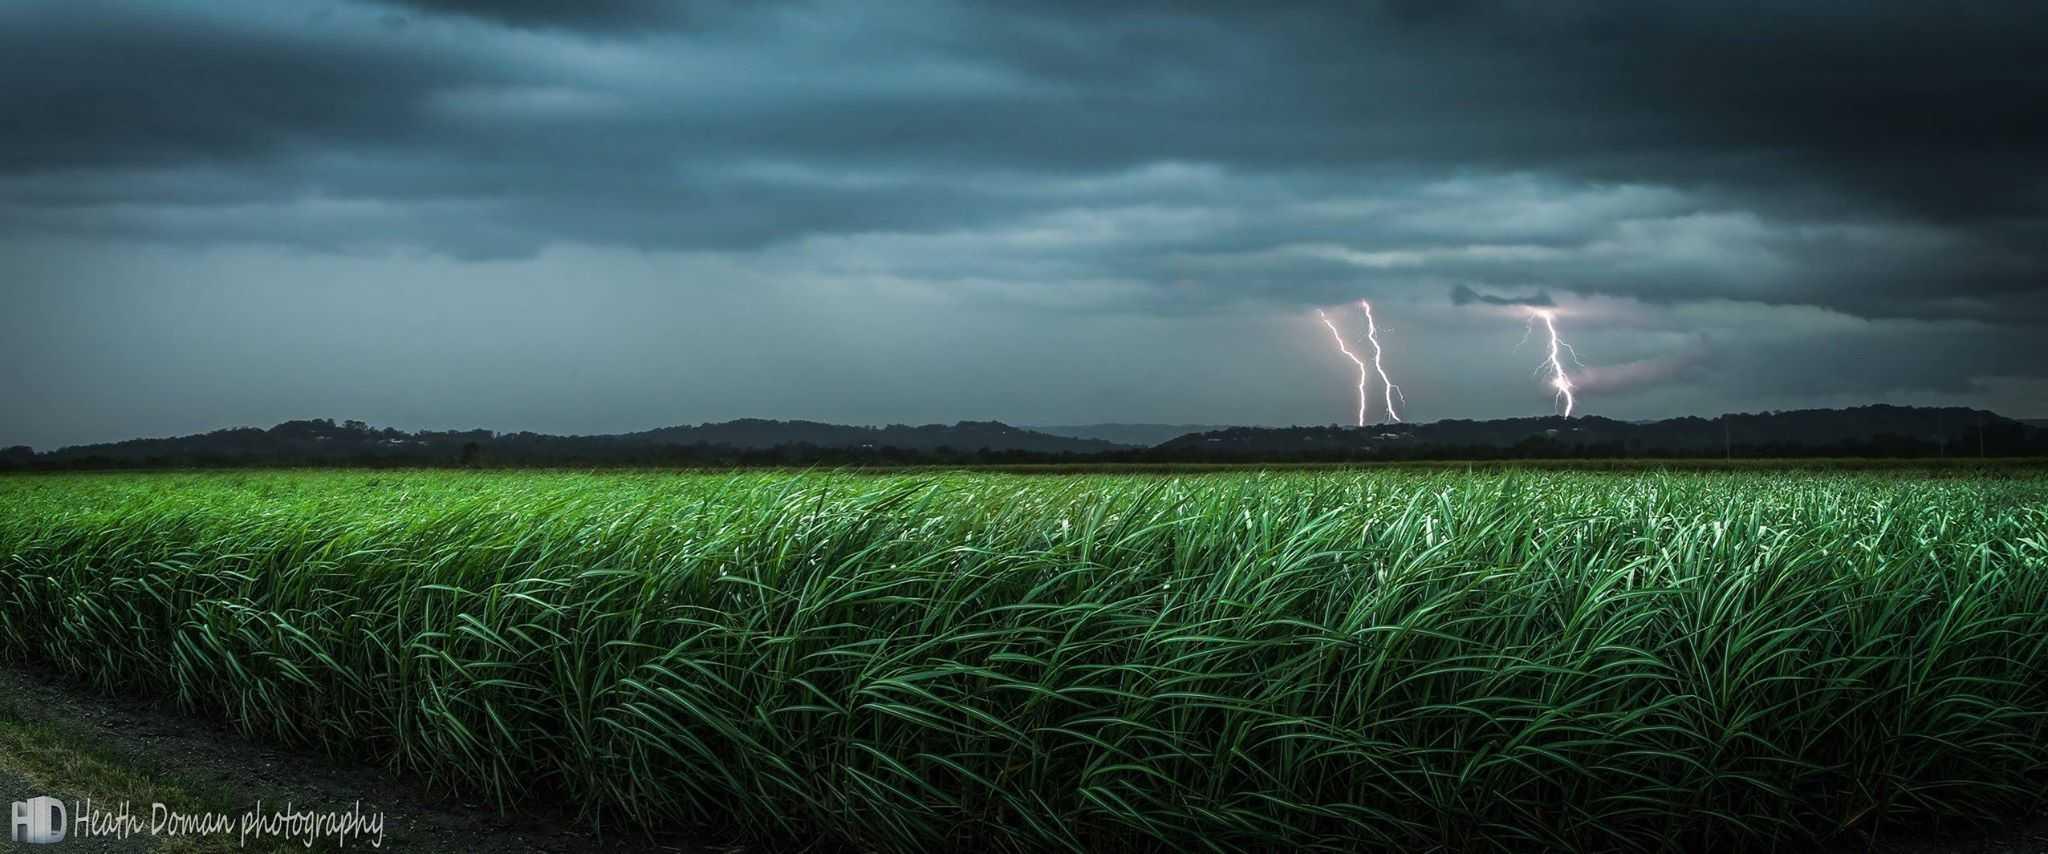 Australian summer storm over cane fields, taken December 2014